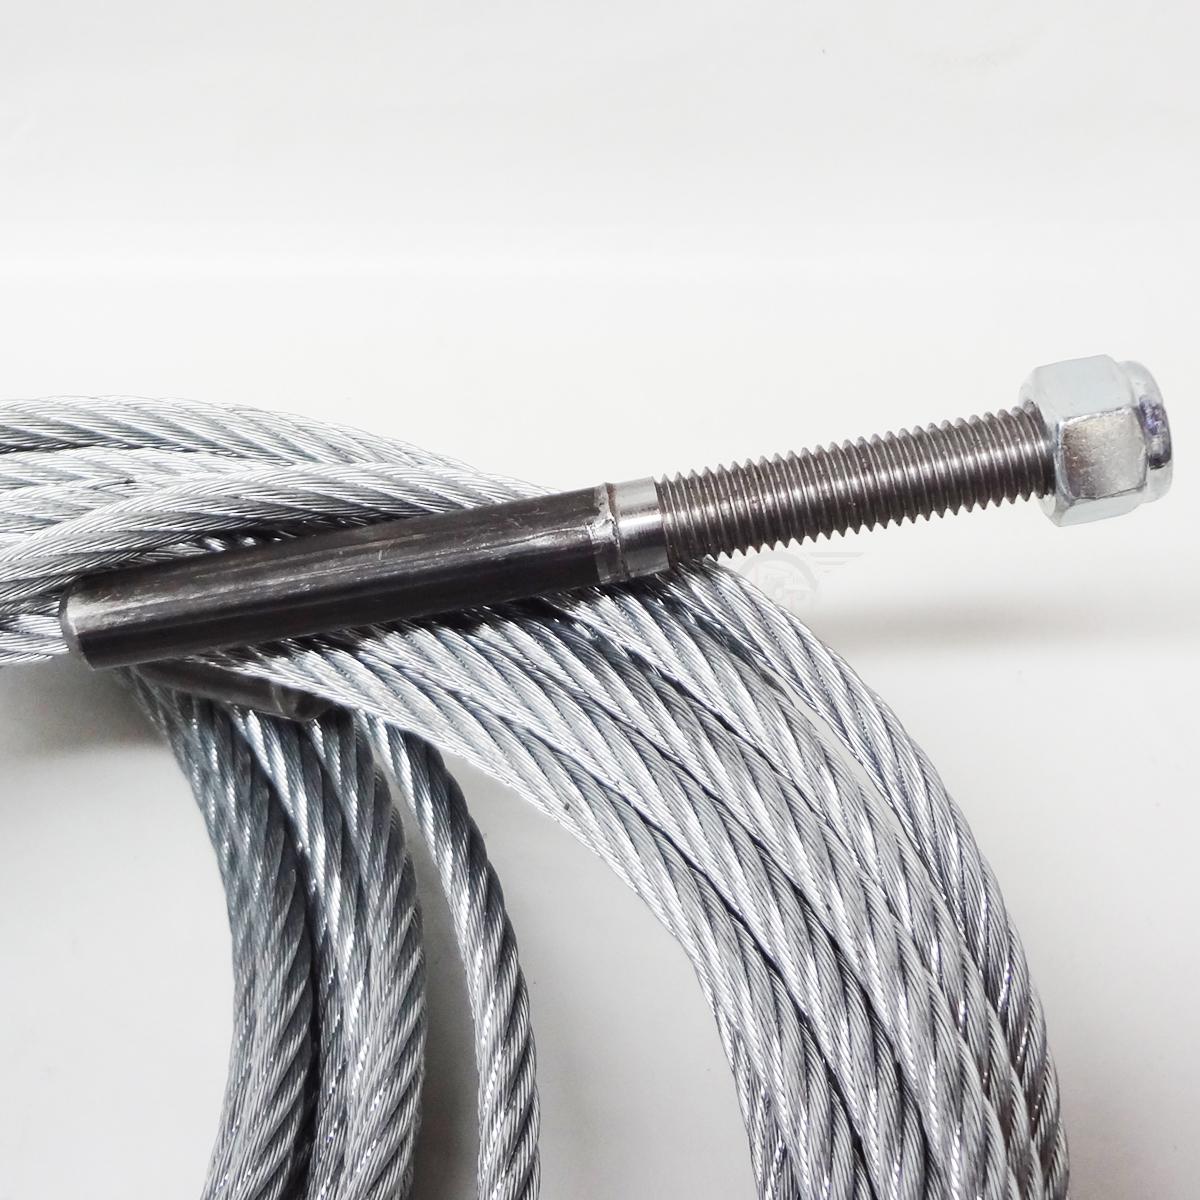 bend pak magnum lift mx 10acx cables 2 post lift set of 2. Black Bedroom Furniture Sets. Home Design Ideas